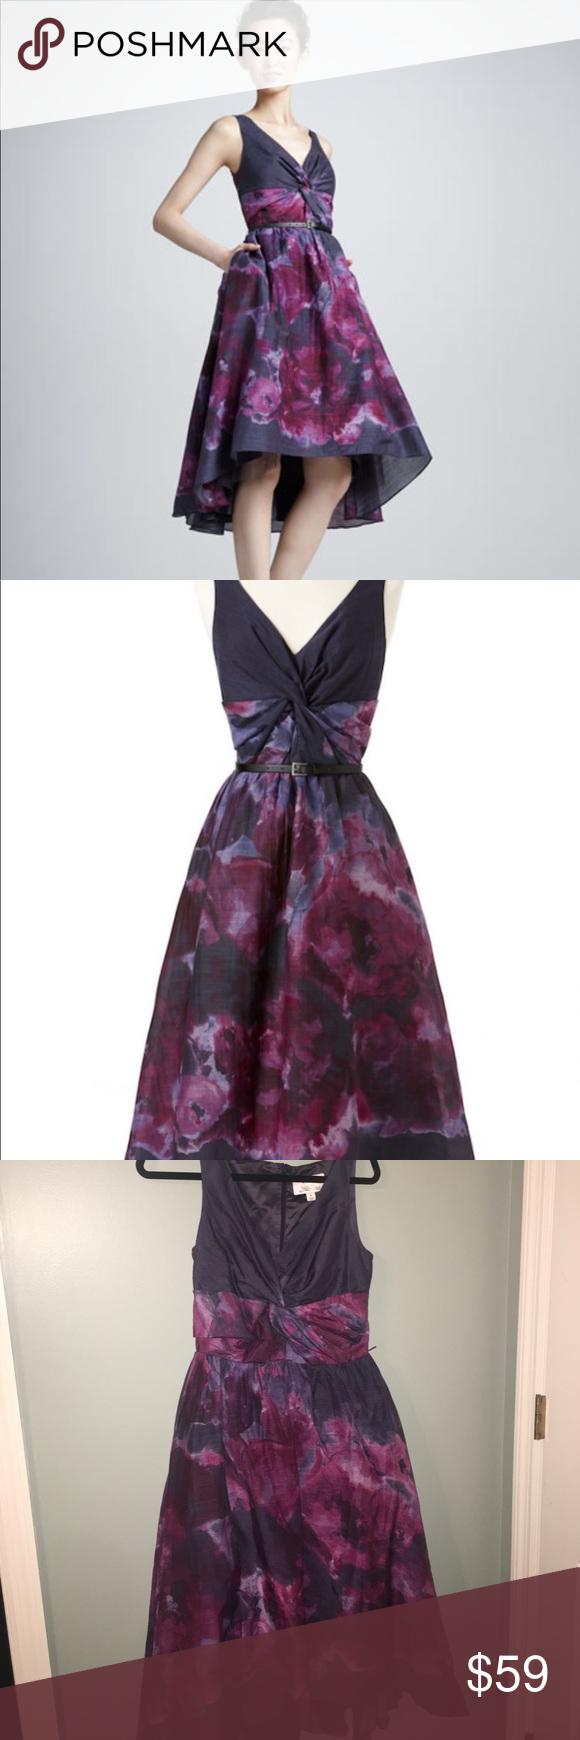 New Neiman Marcus Target Lela Rose Watercolor High Low Dress Silk Blend Womens 8